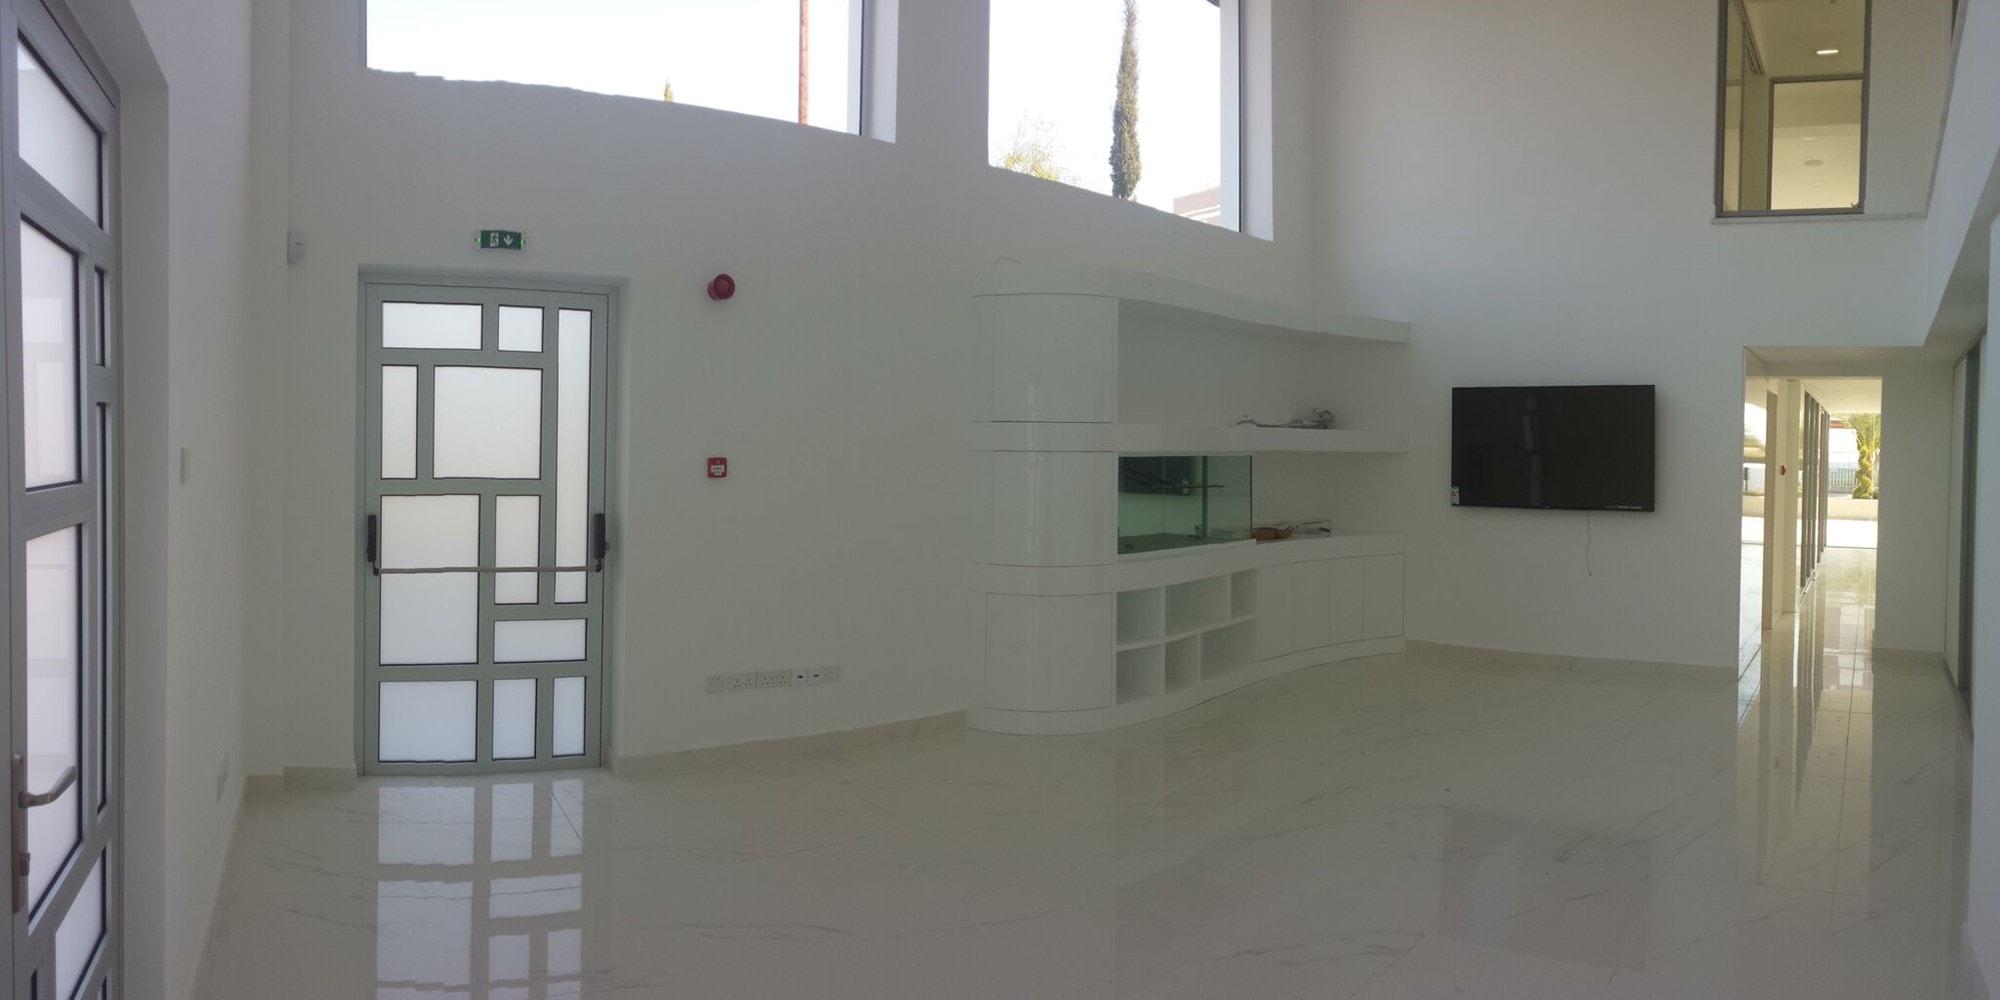 Office in Germasoyia-Potamos